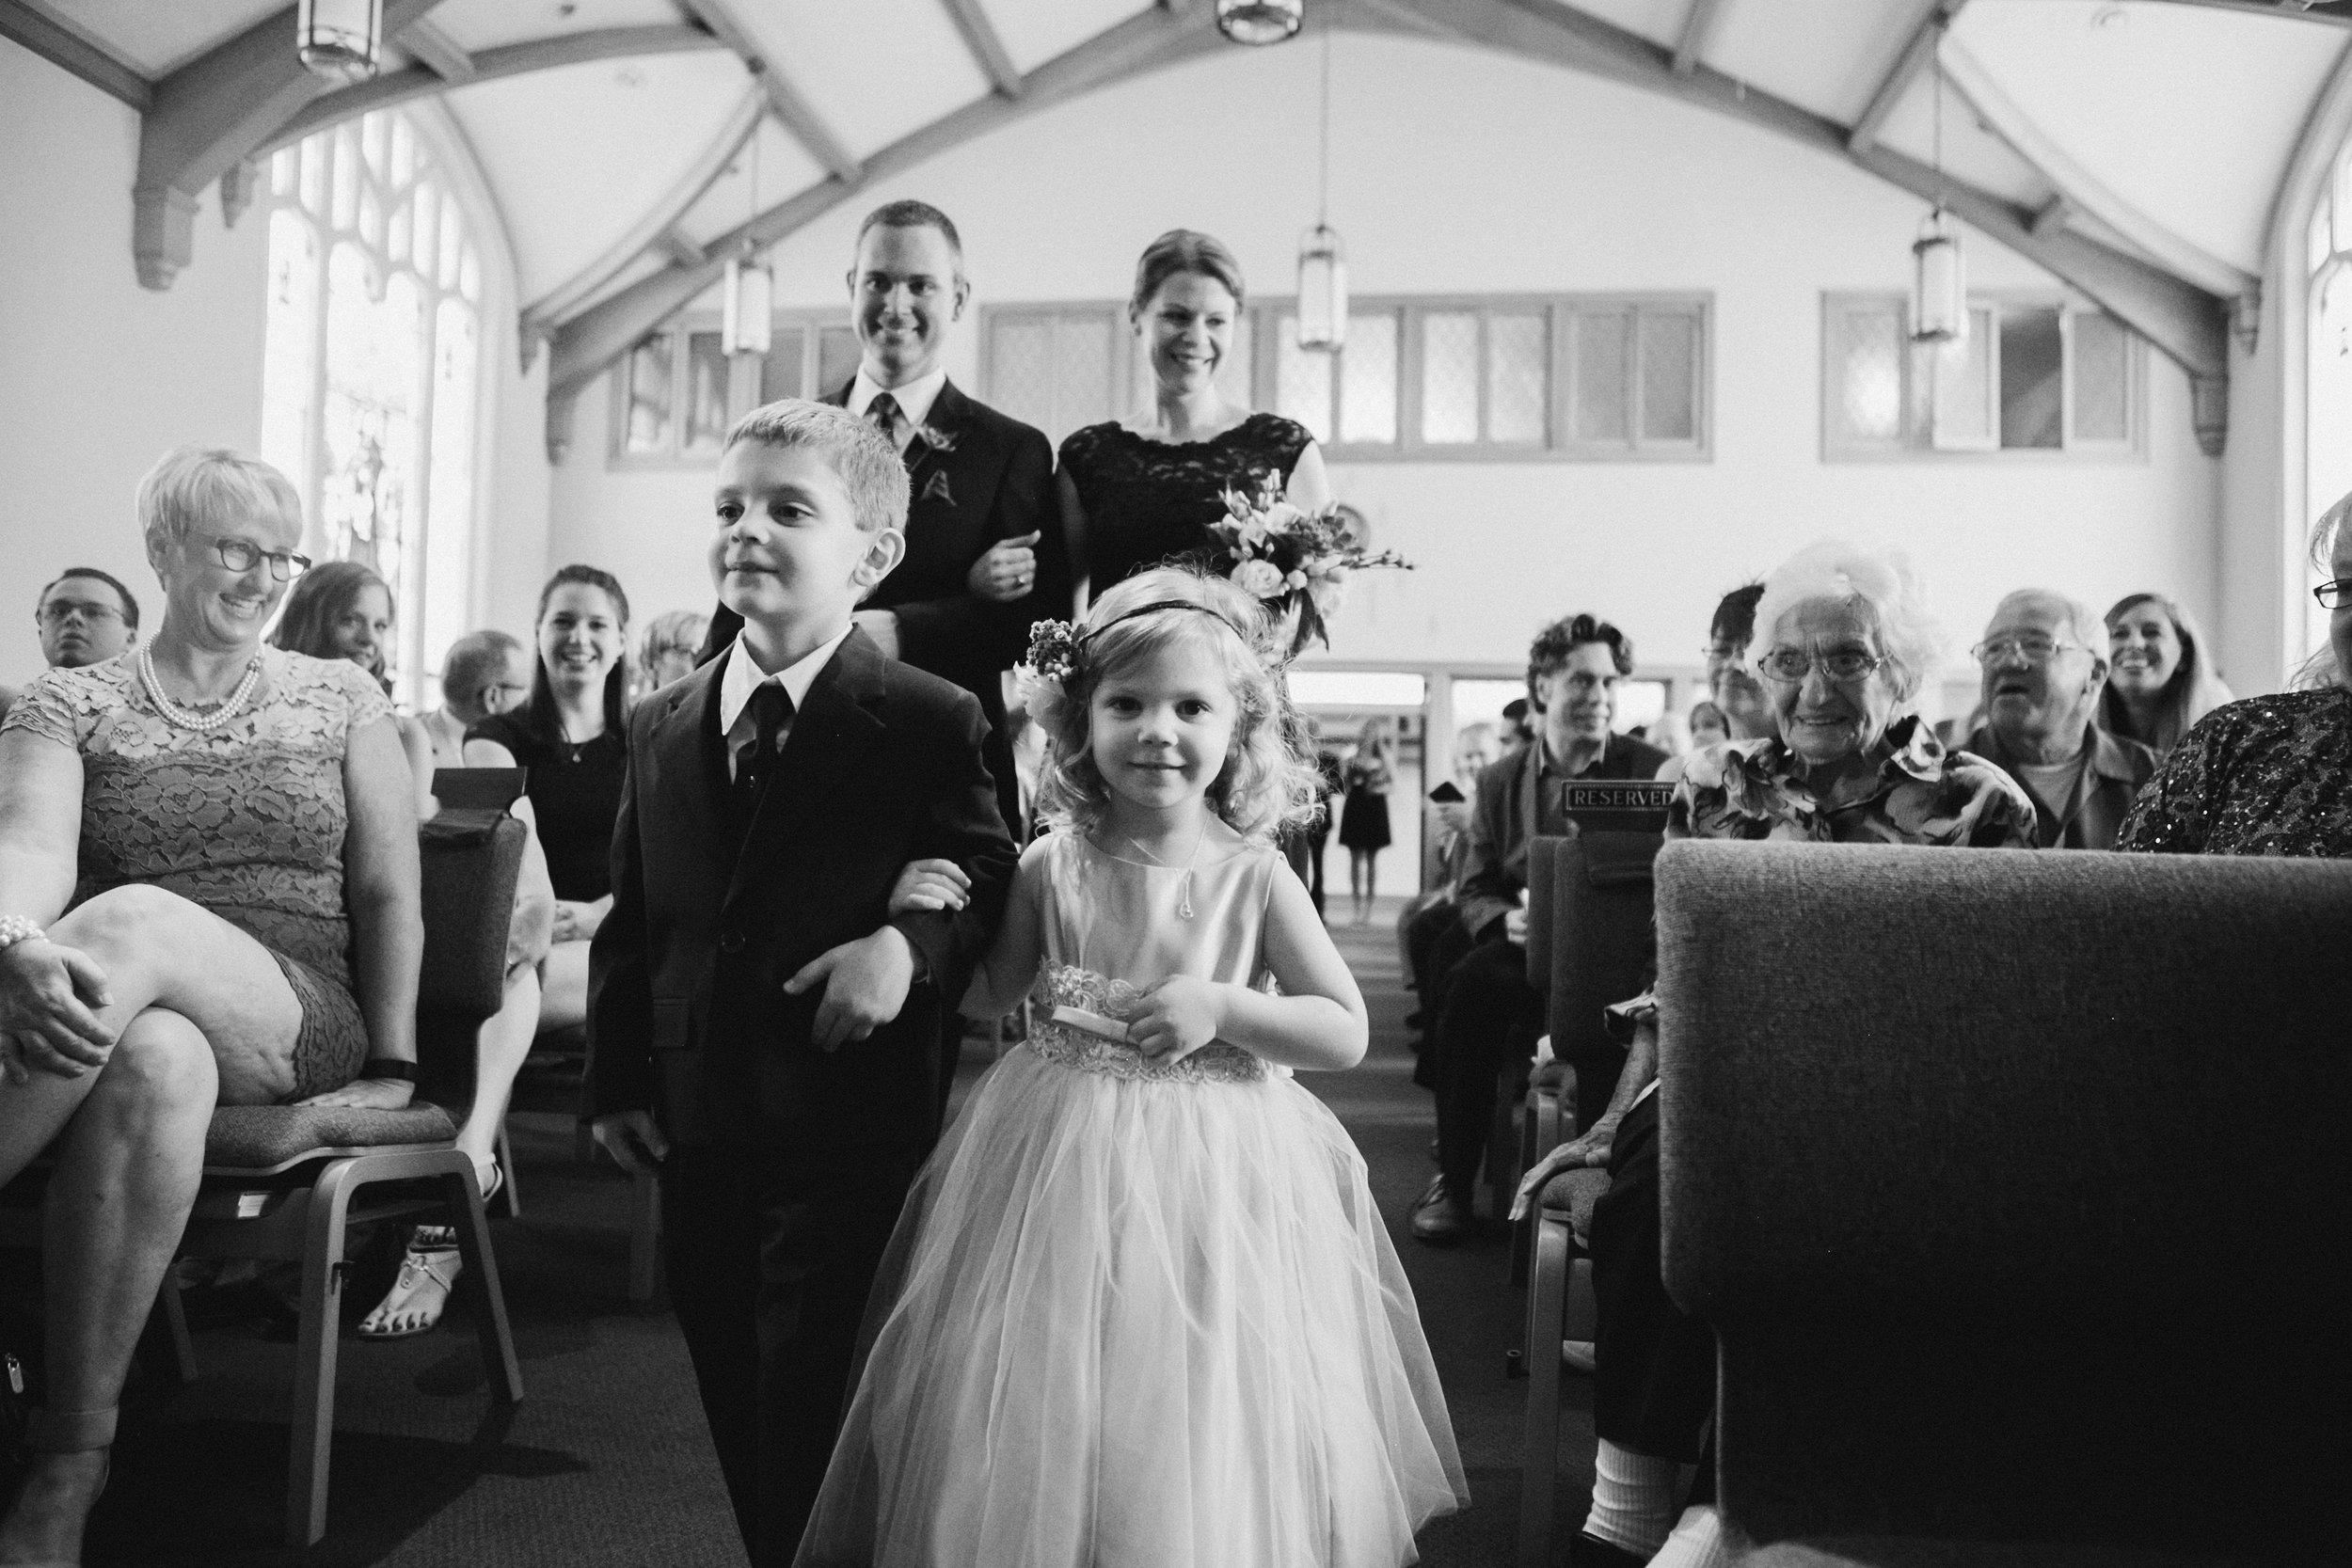 wisconsin-wedding-acowsay-uttke-photography-26.jpg